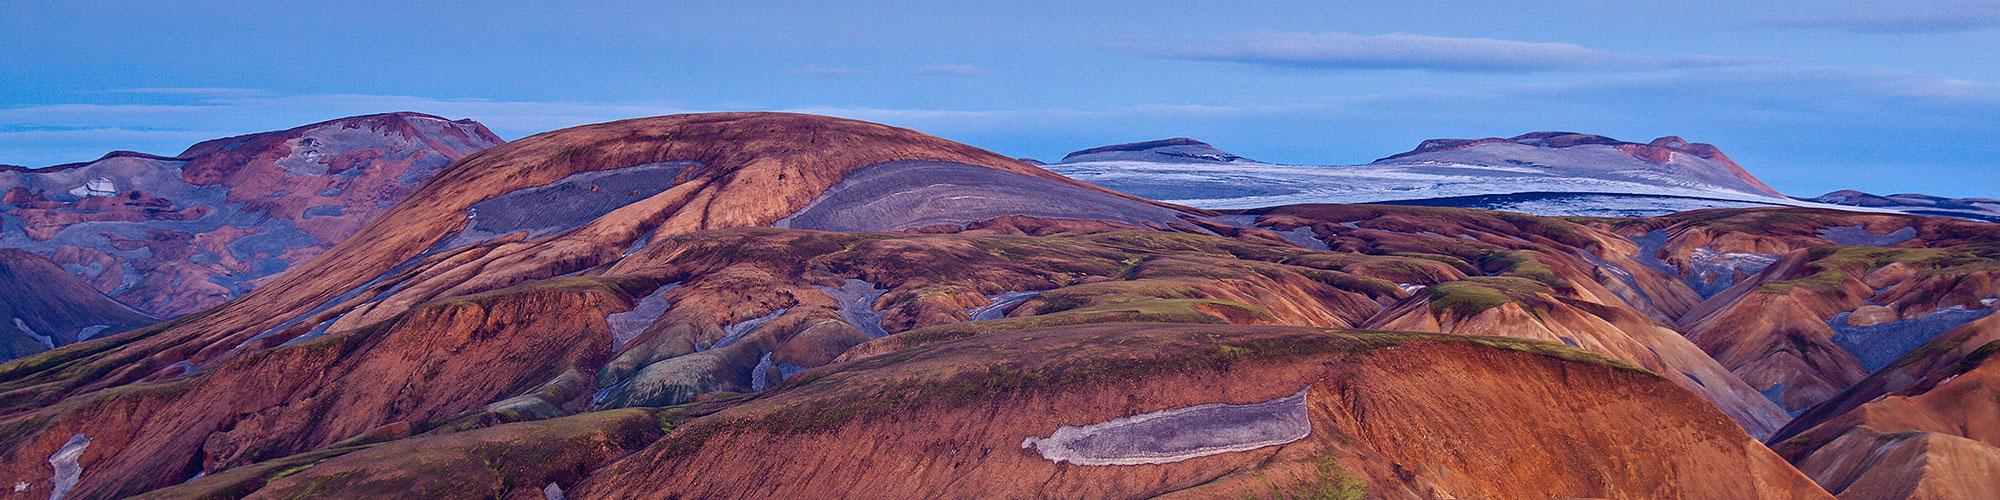 Landmannalaugar - ©Theo Bosboom